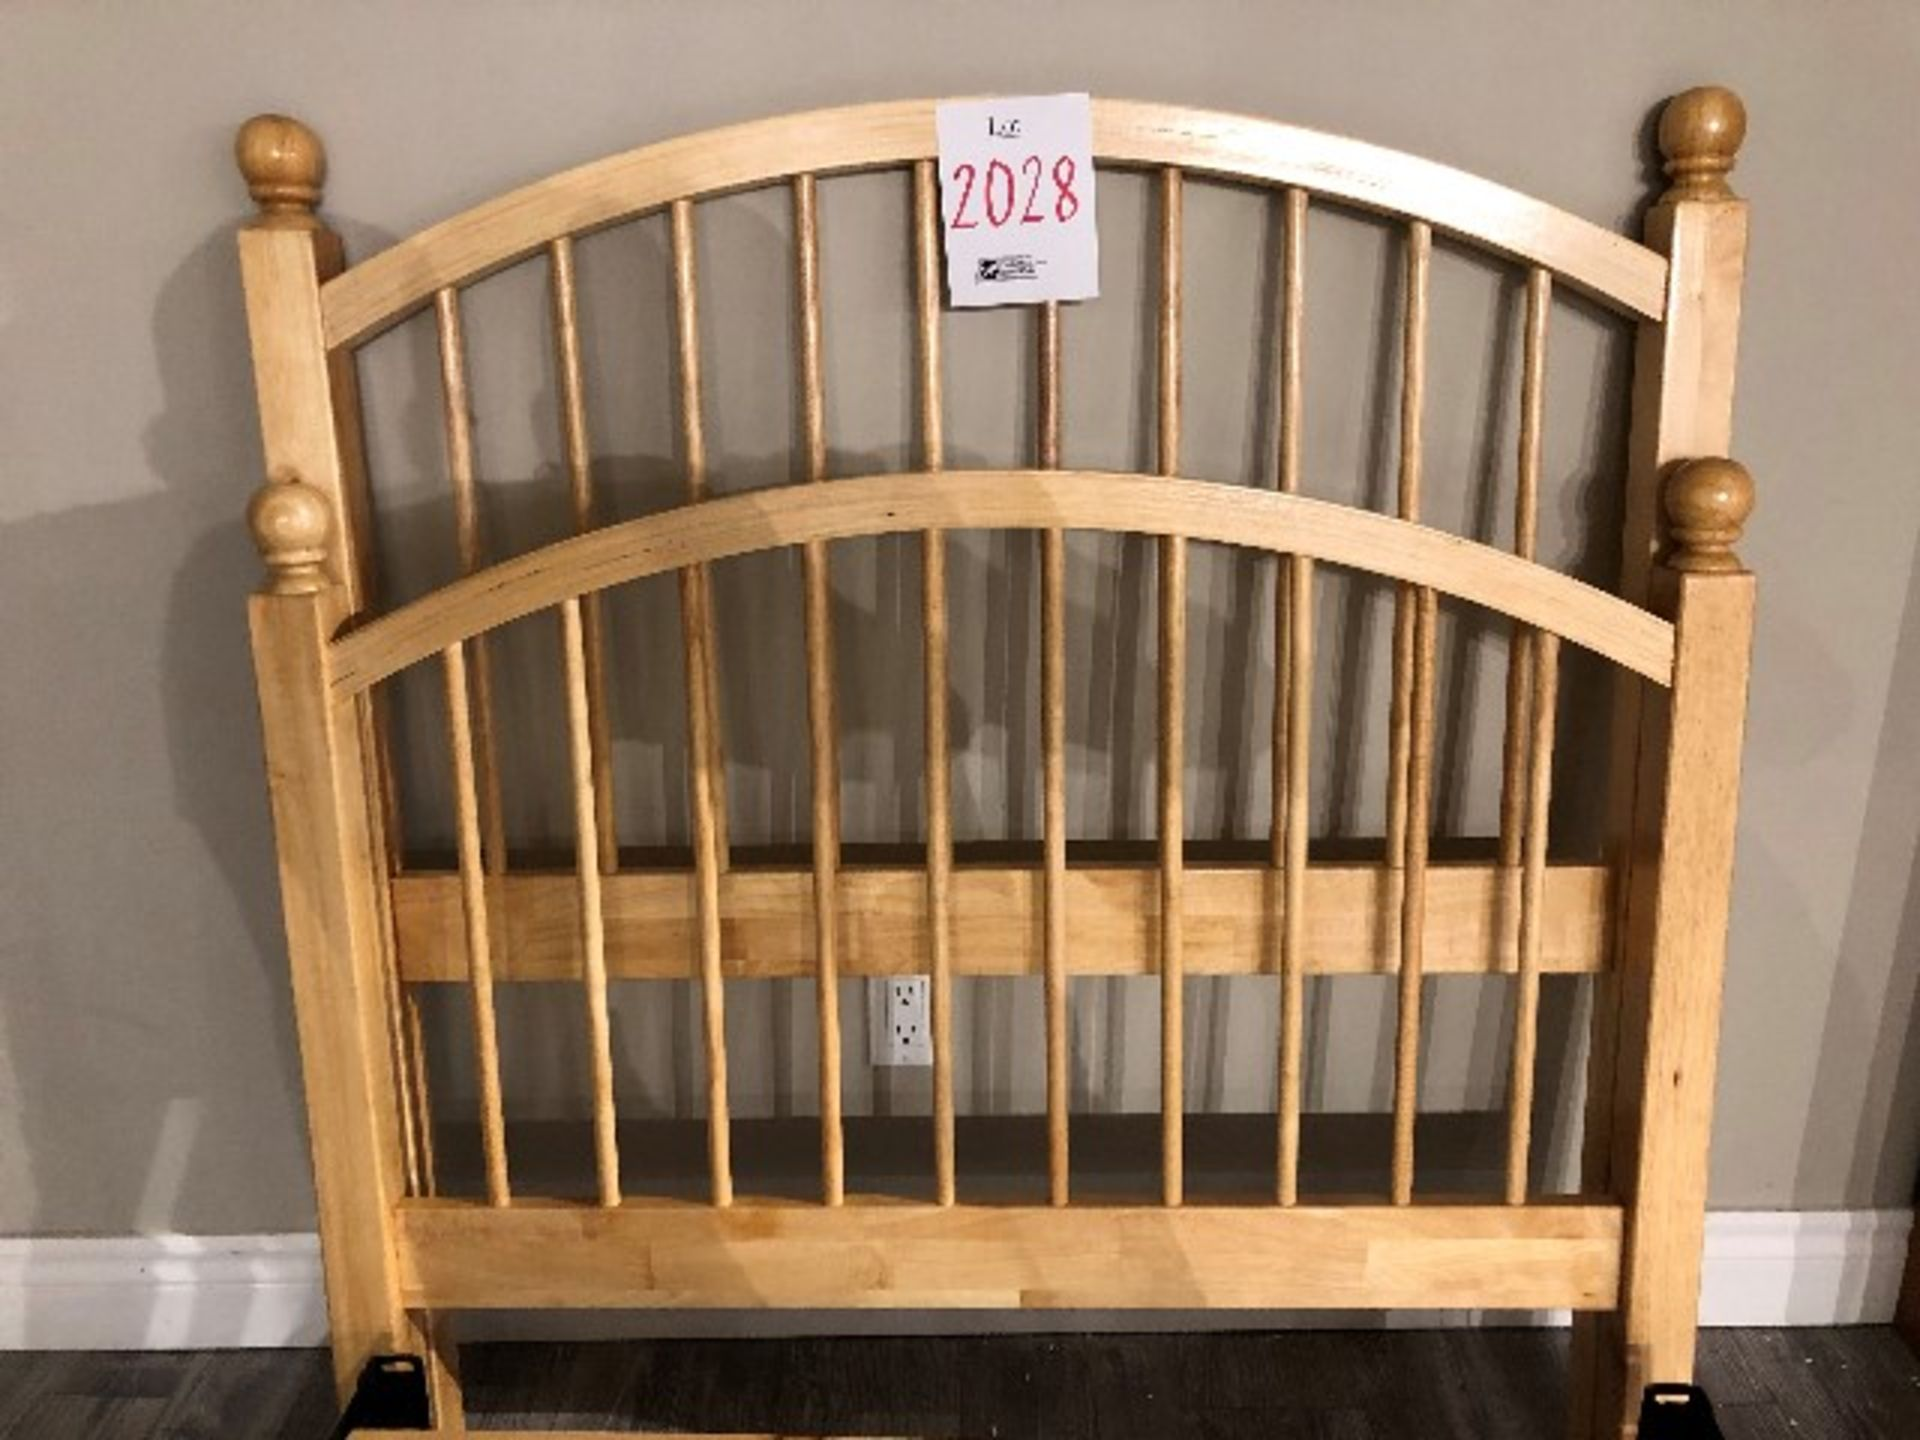 Lot 2028 - Single bed frame, headboard, footboard & slats (Lot)